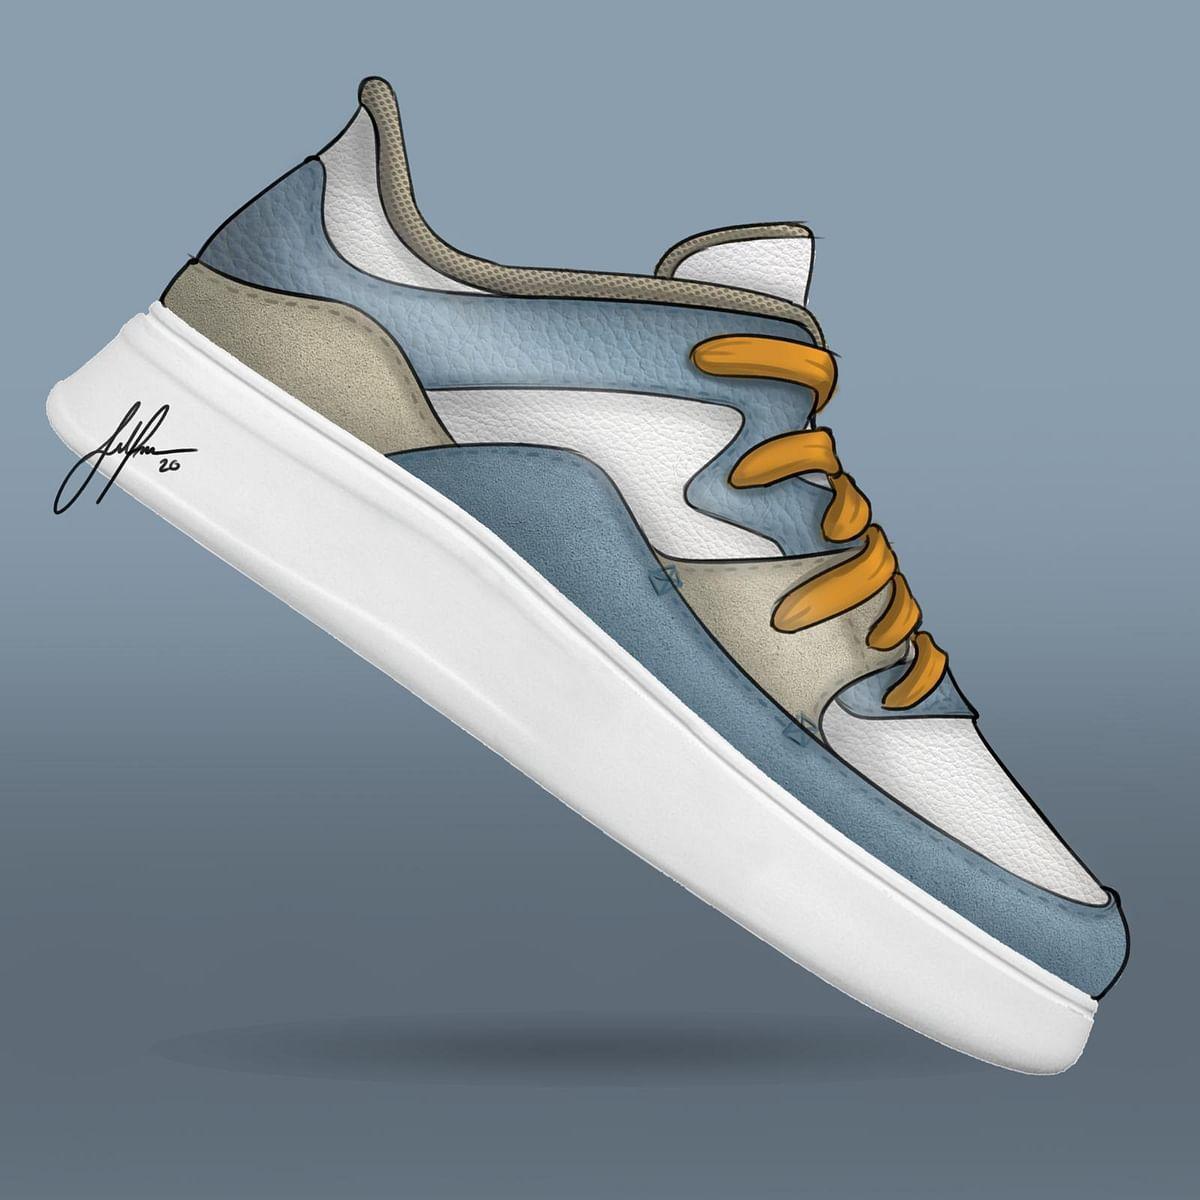 Seth Fowler's initial design